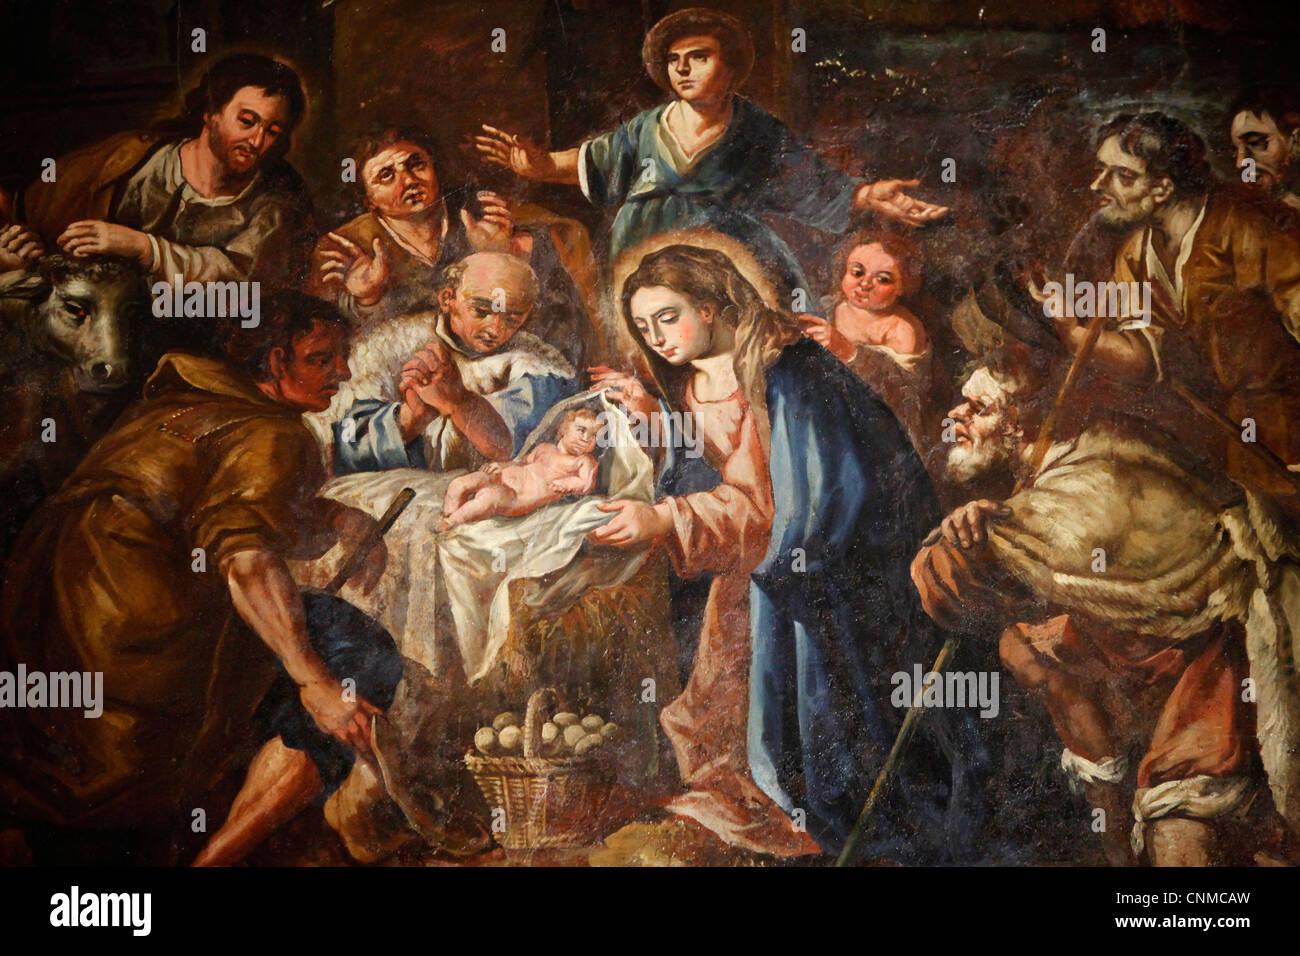 Nativity painting in Iglesia ex-conventual de Ntra. Sra del Carmen, Antequera, Andalucia, Spain, Europe - Stock Image